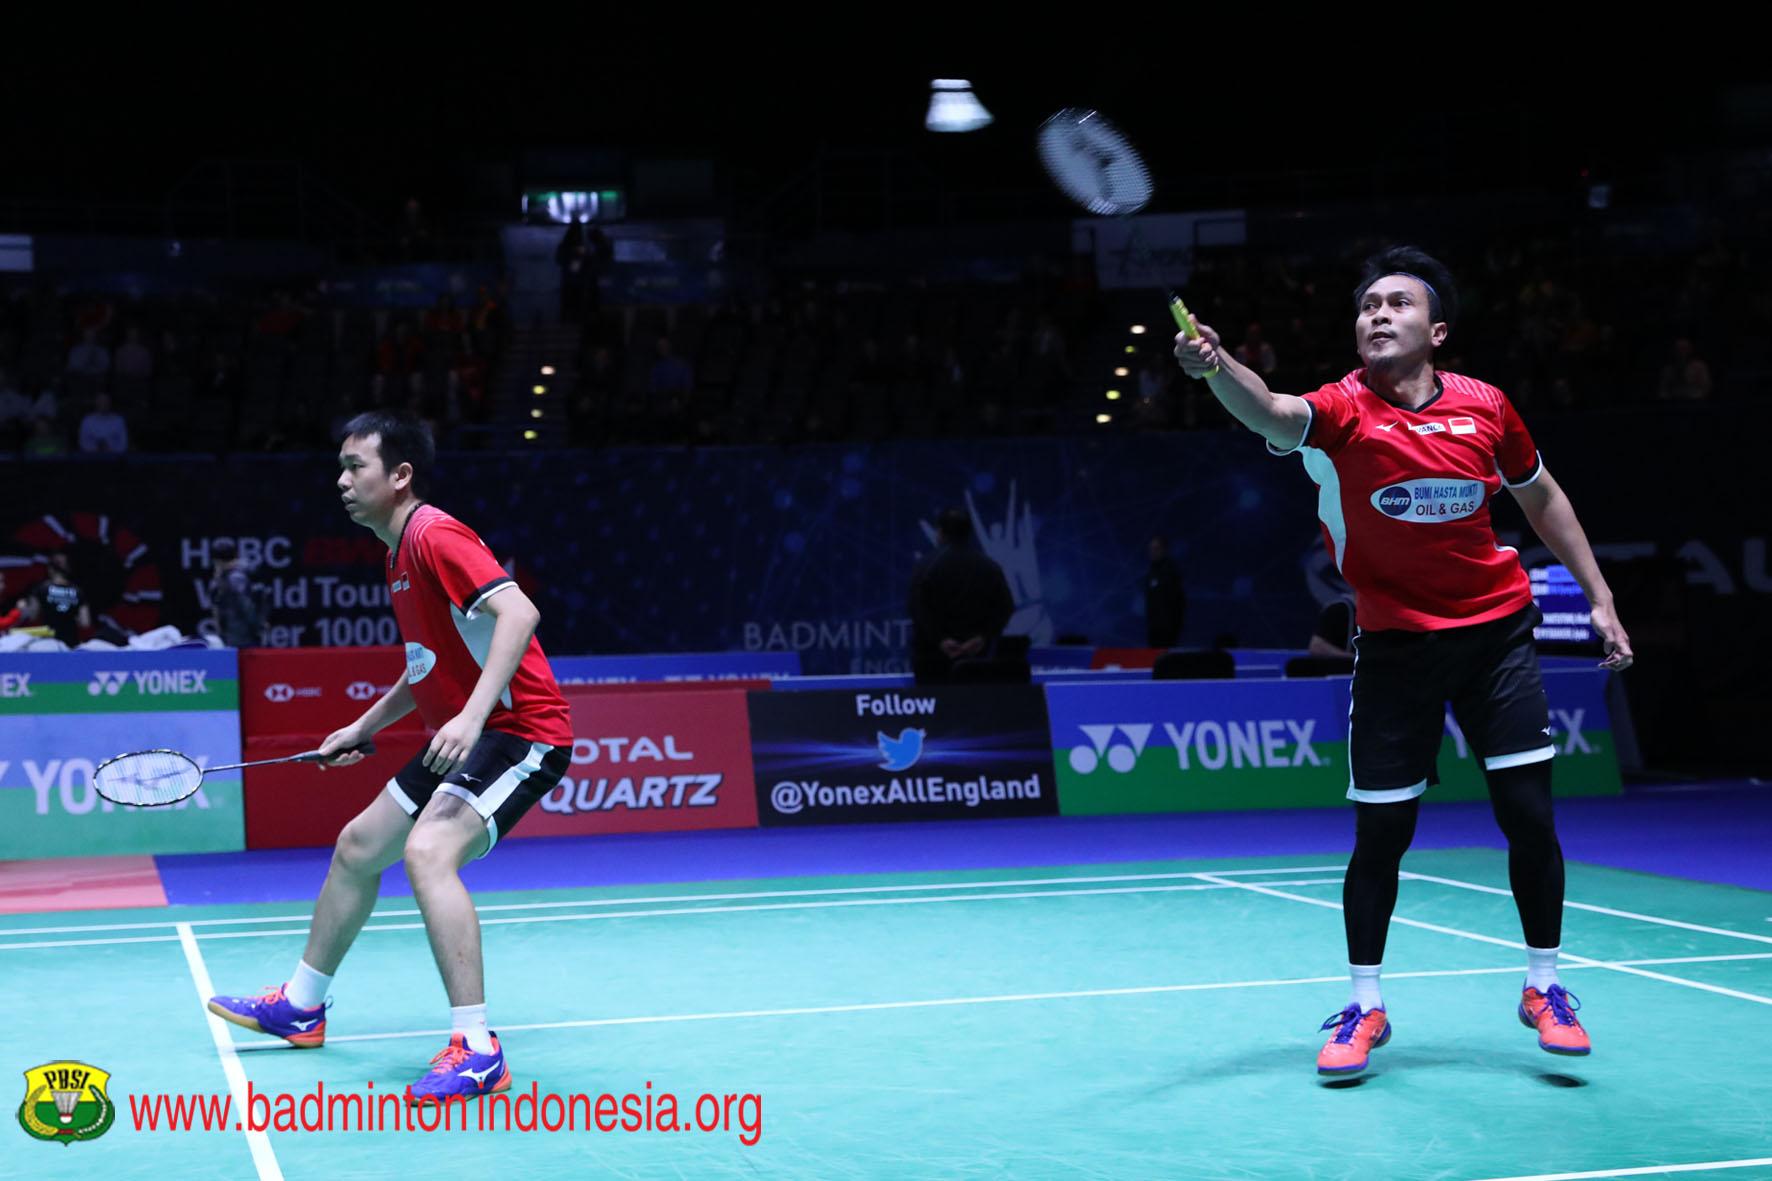 https: img.okezone.com content 2019 04 12 40 2042677 ikuti-jejak-marcus-kevin-hendra-ahsan-ke-semifinal-singapura-open-2019-DUDYR5tw1l.jpg